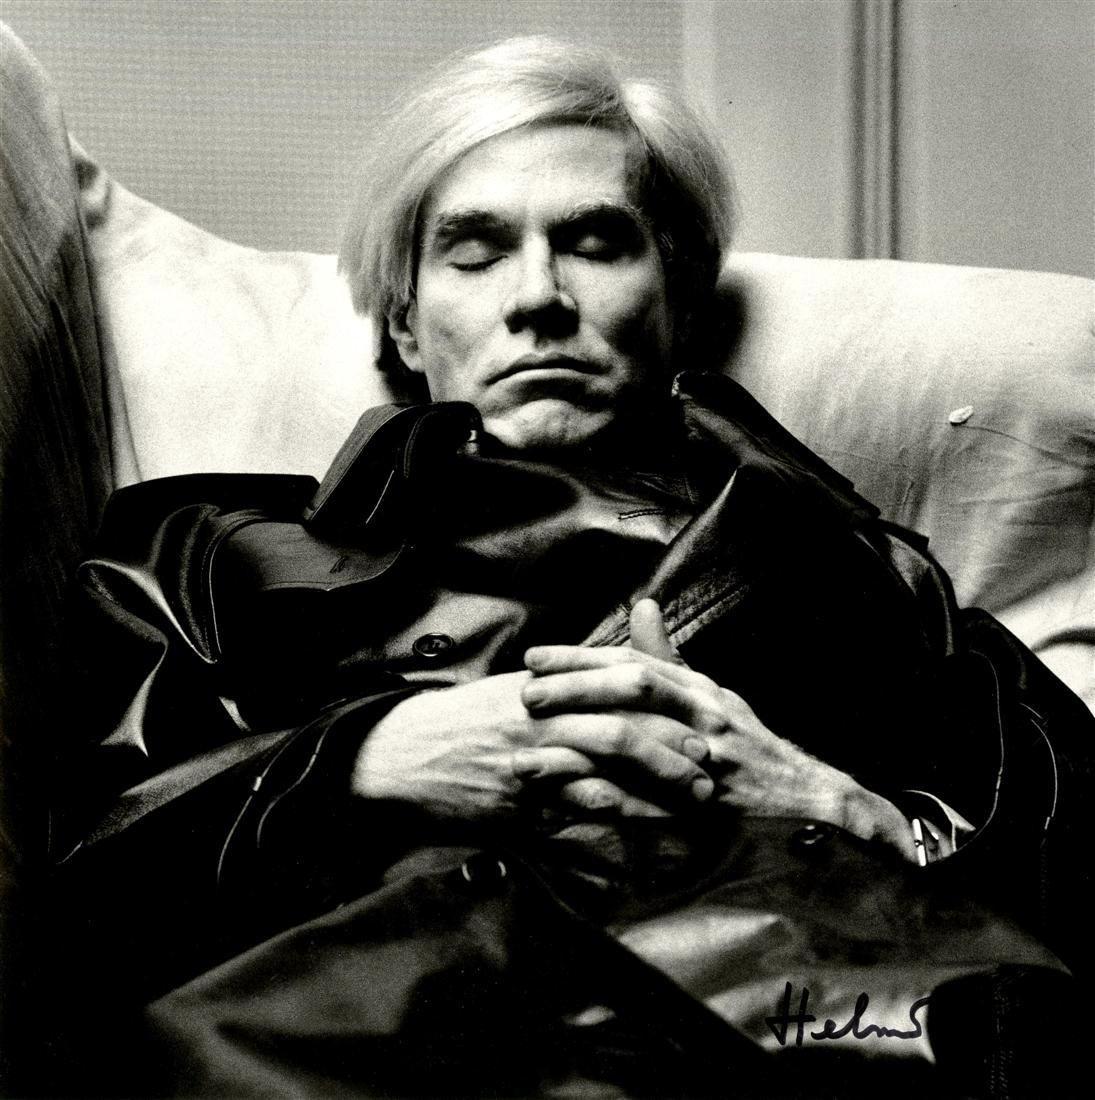 624: HELMUT NEWTON - Andy Warhol, Sleeping